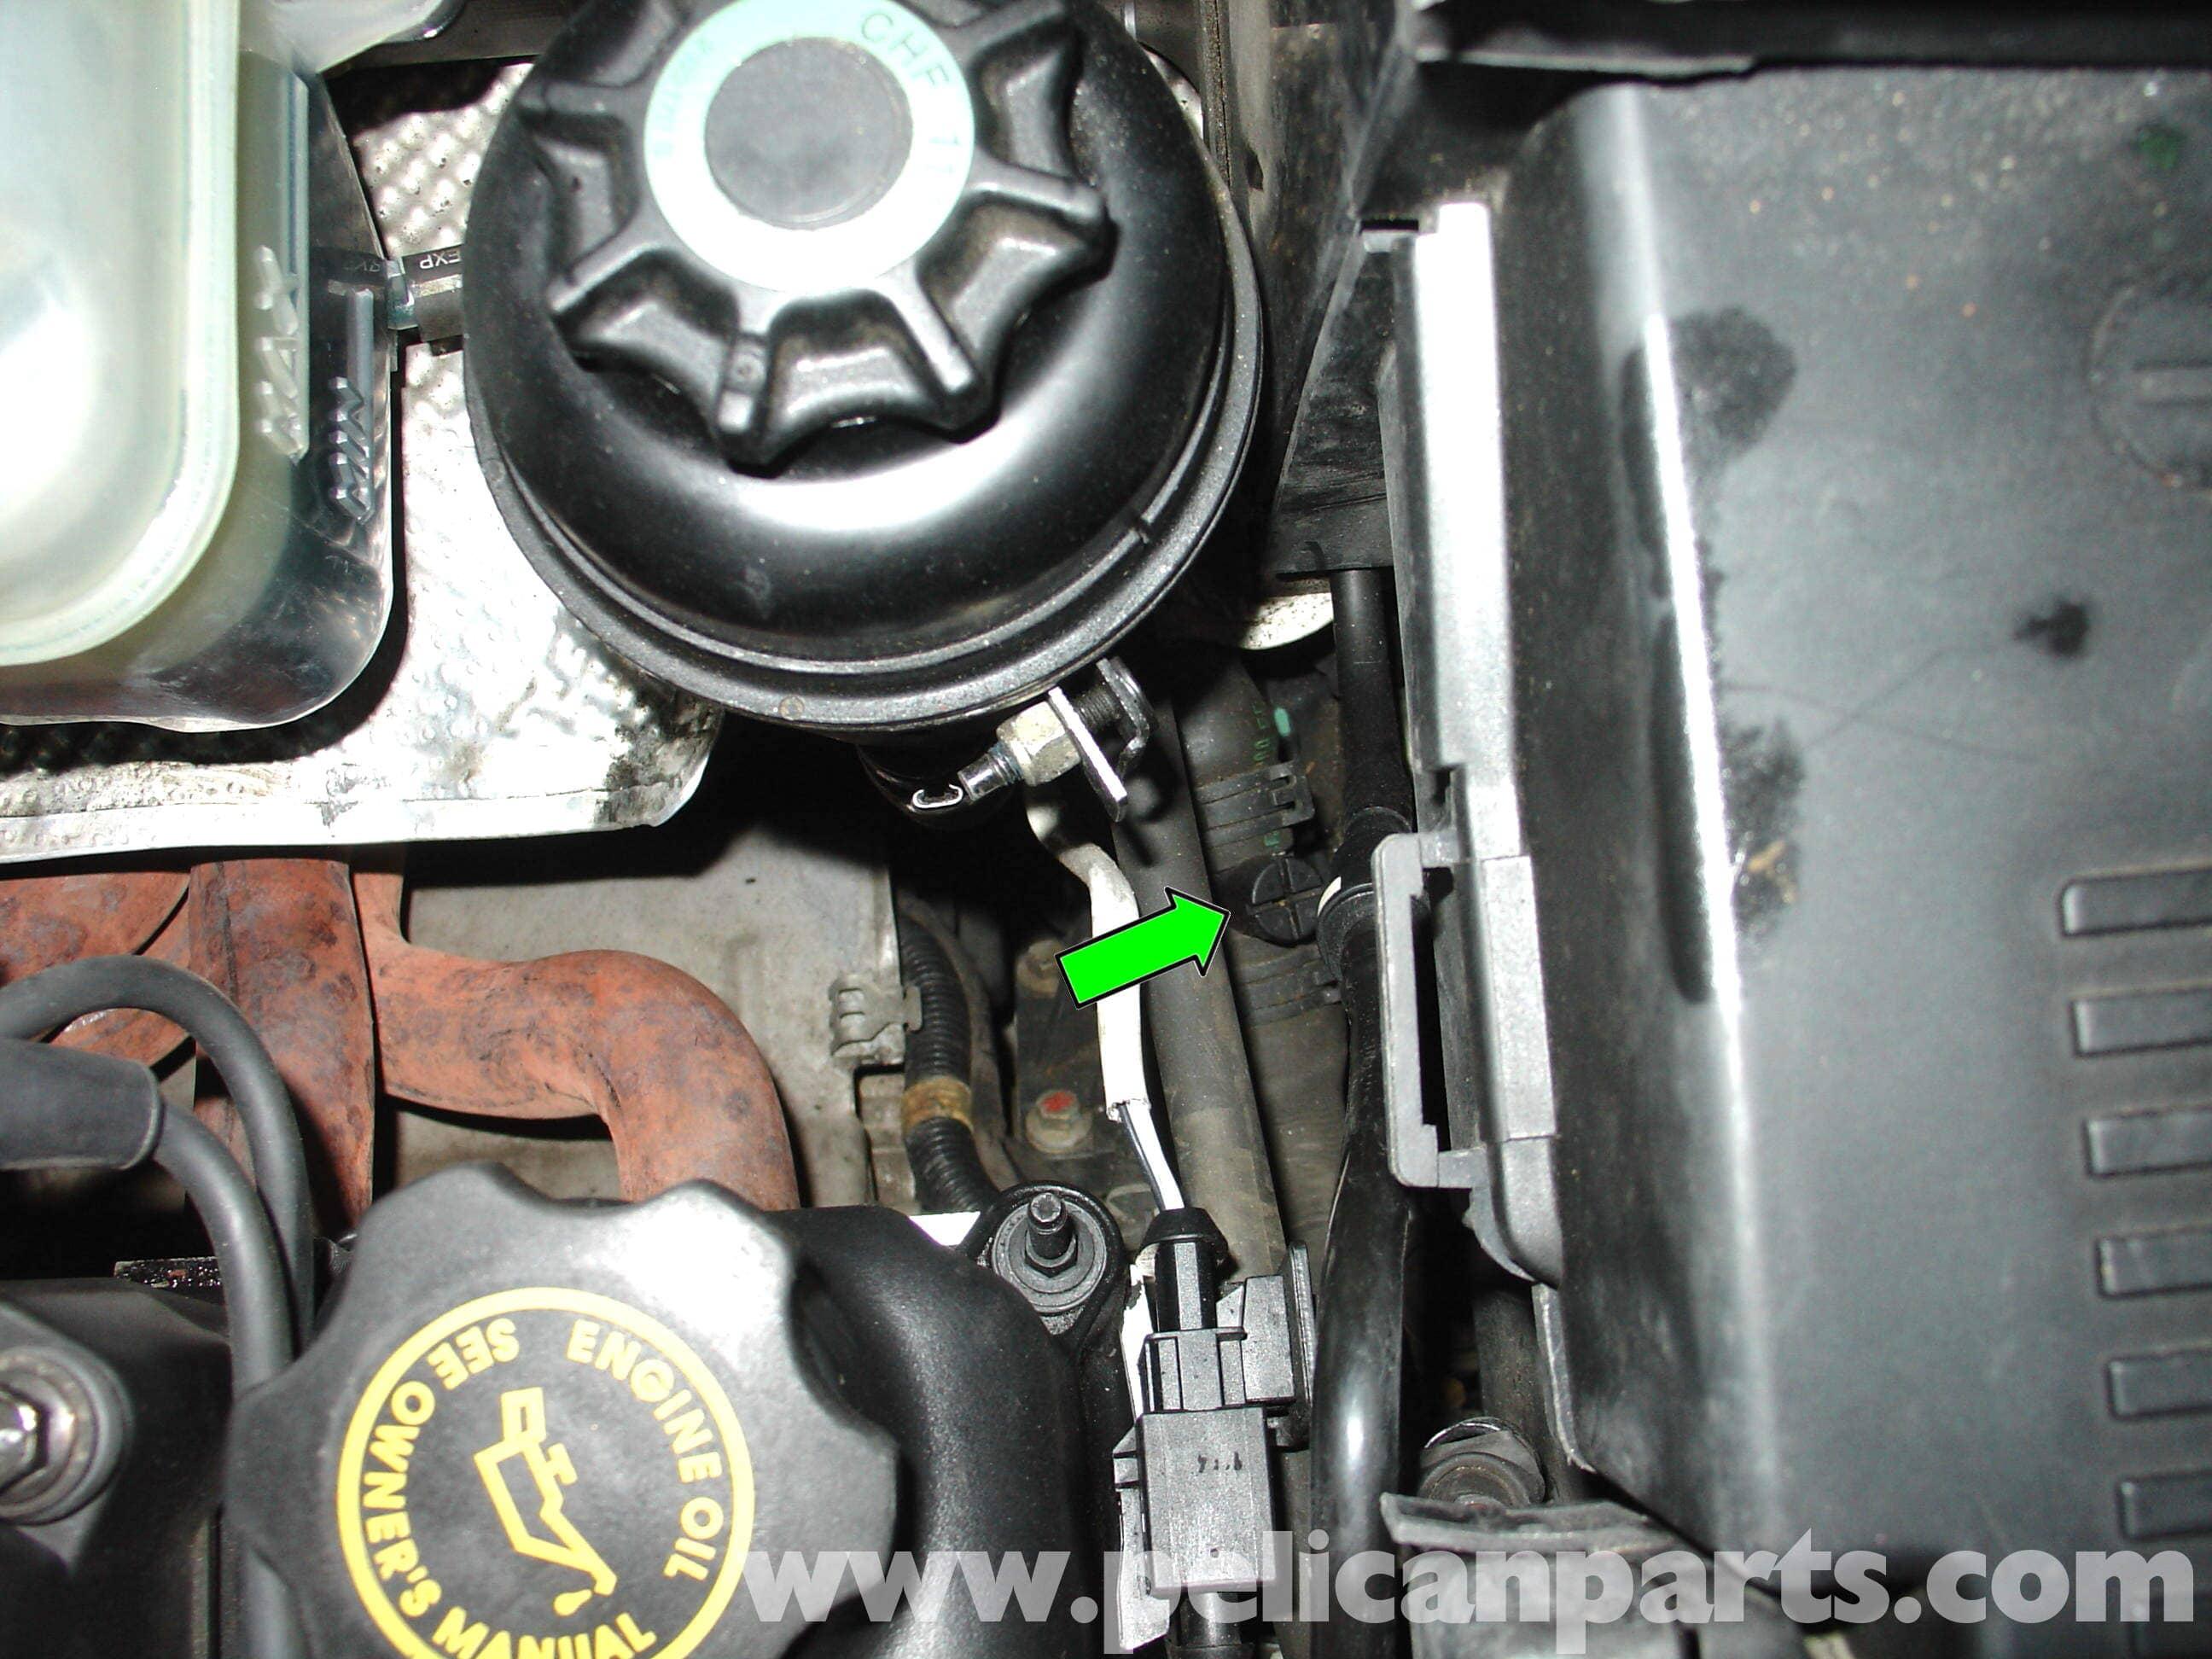 MINI Cooper Coolant Change RRR  Pelican Parts - 03 mini cooper s wiring diagram